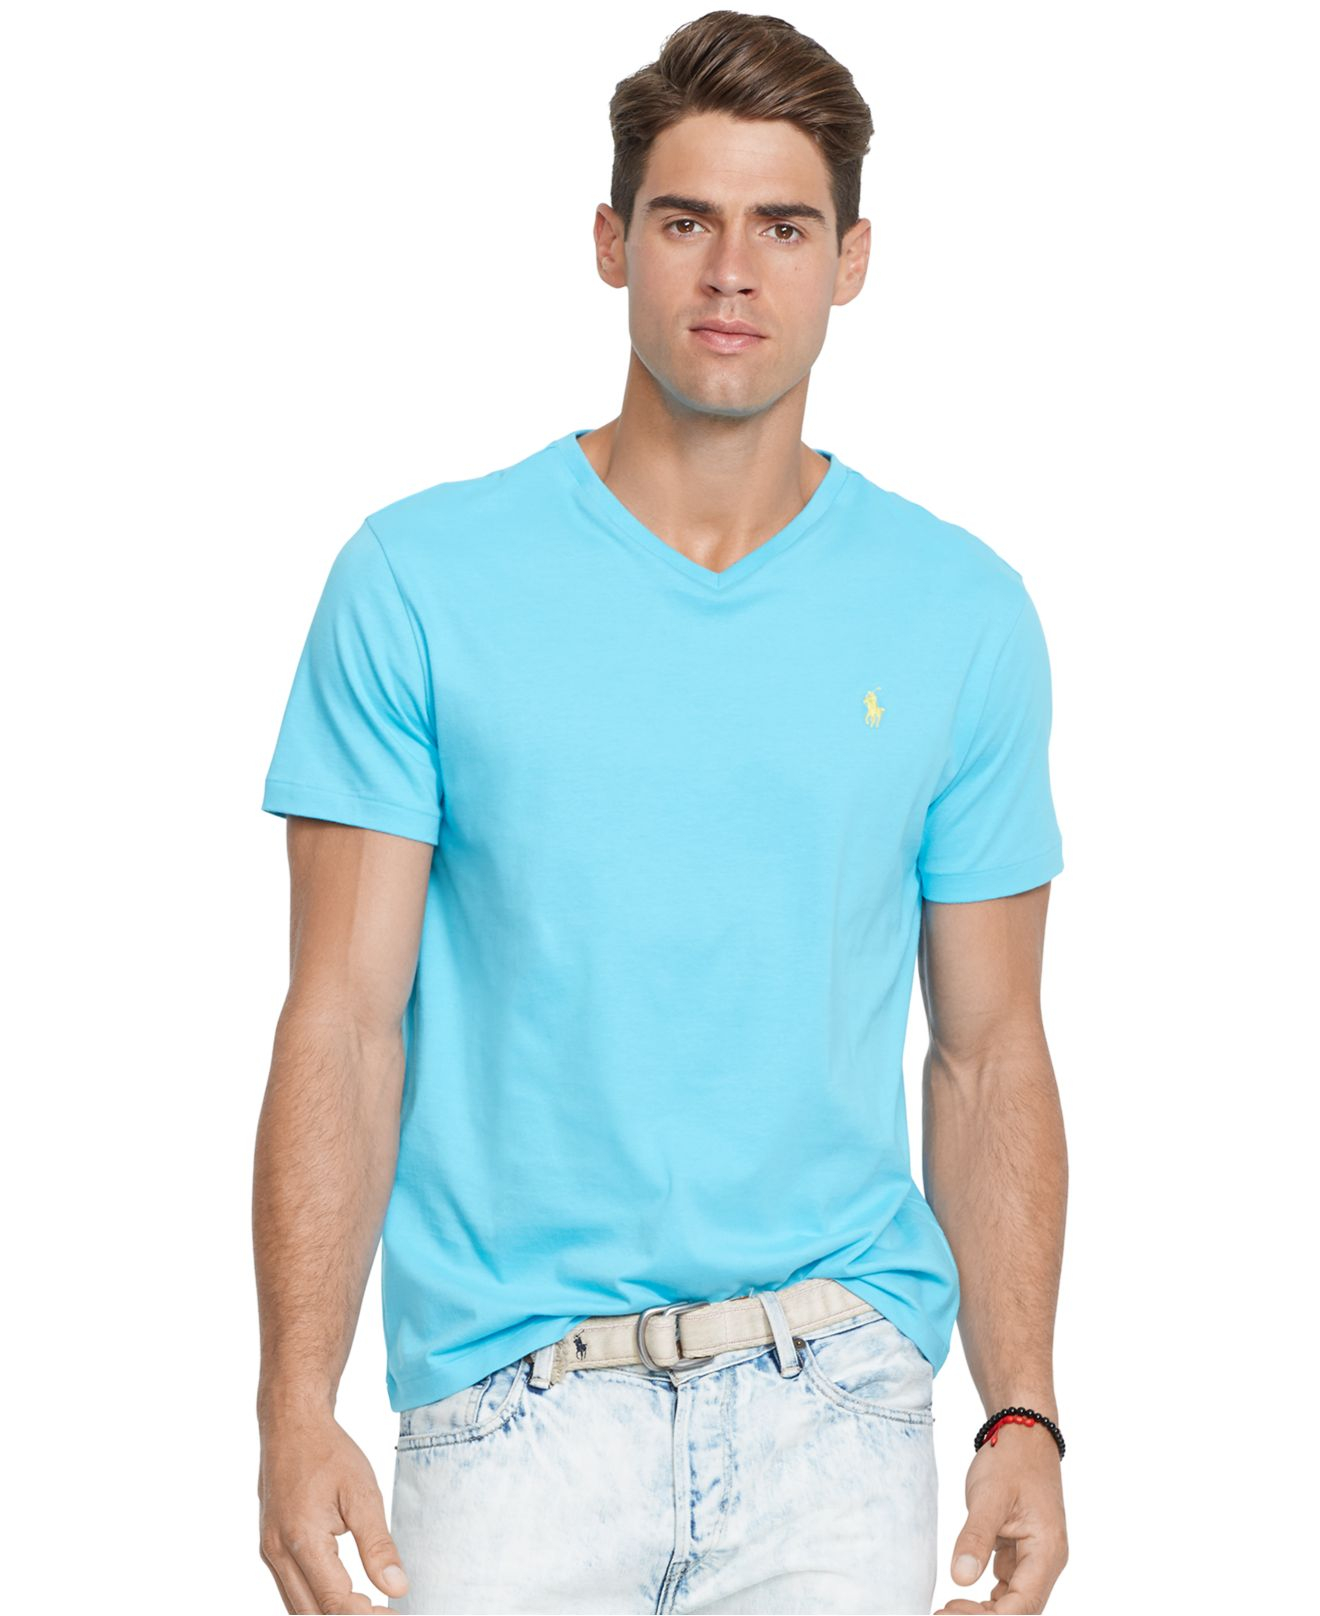 Polo Ralph Lauren Jersey V Neck T Shirt In Blue For Men Lyst